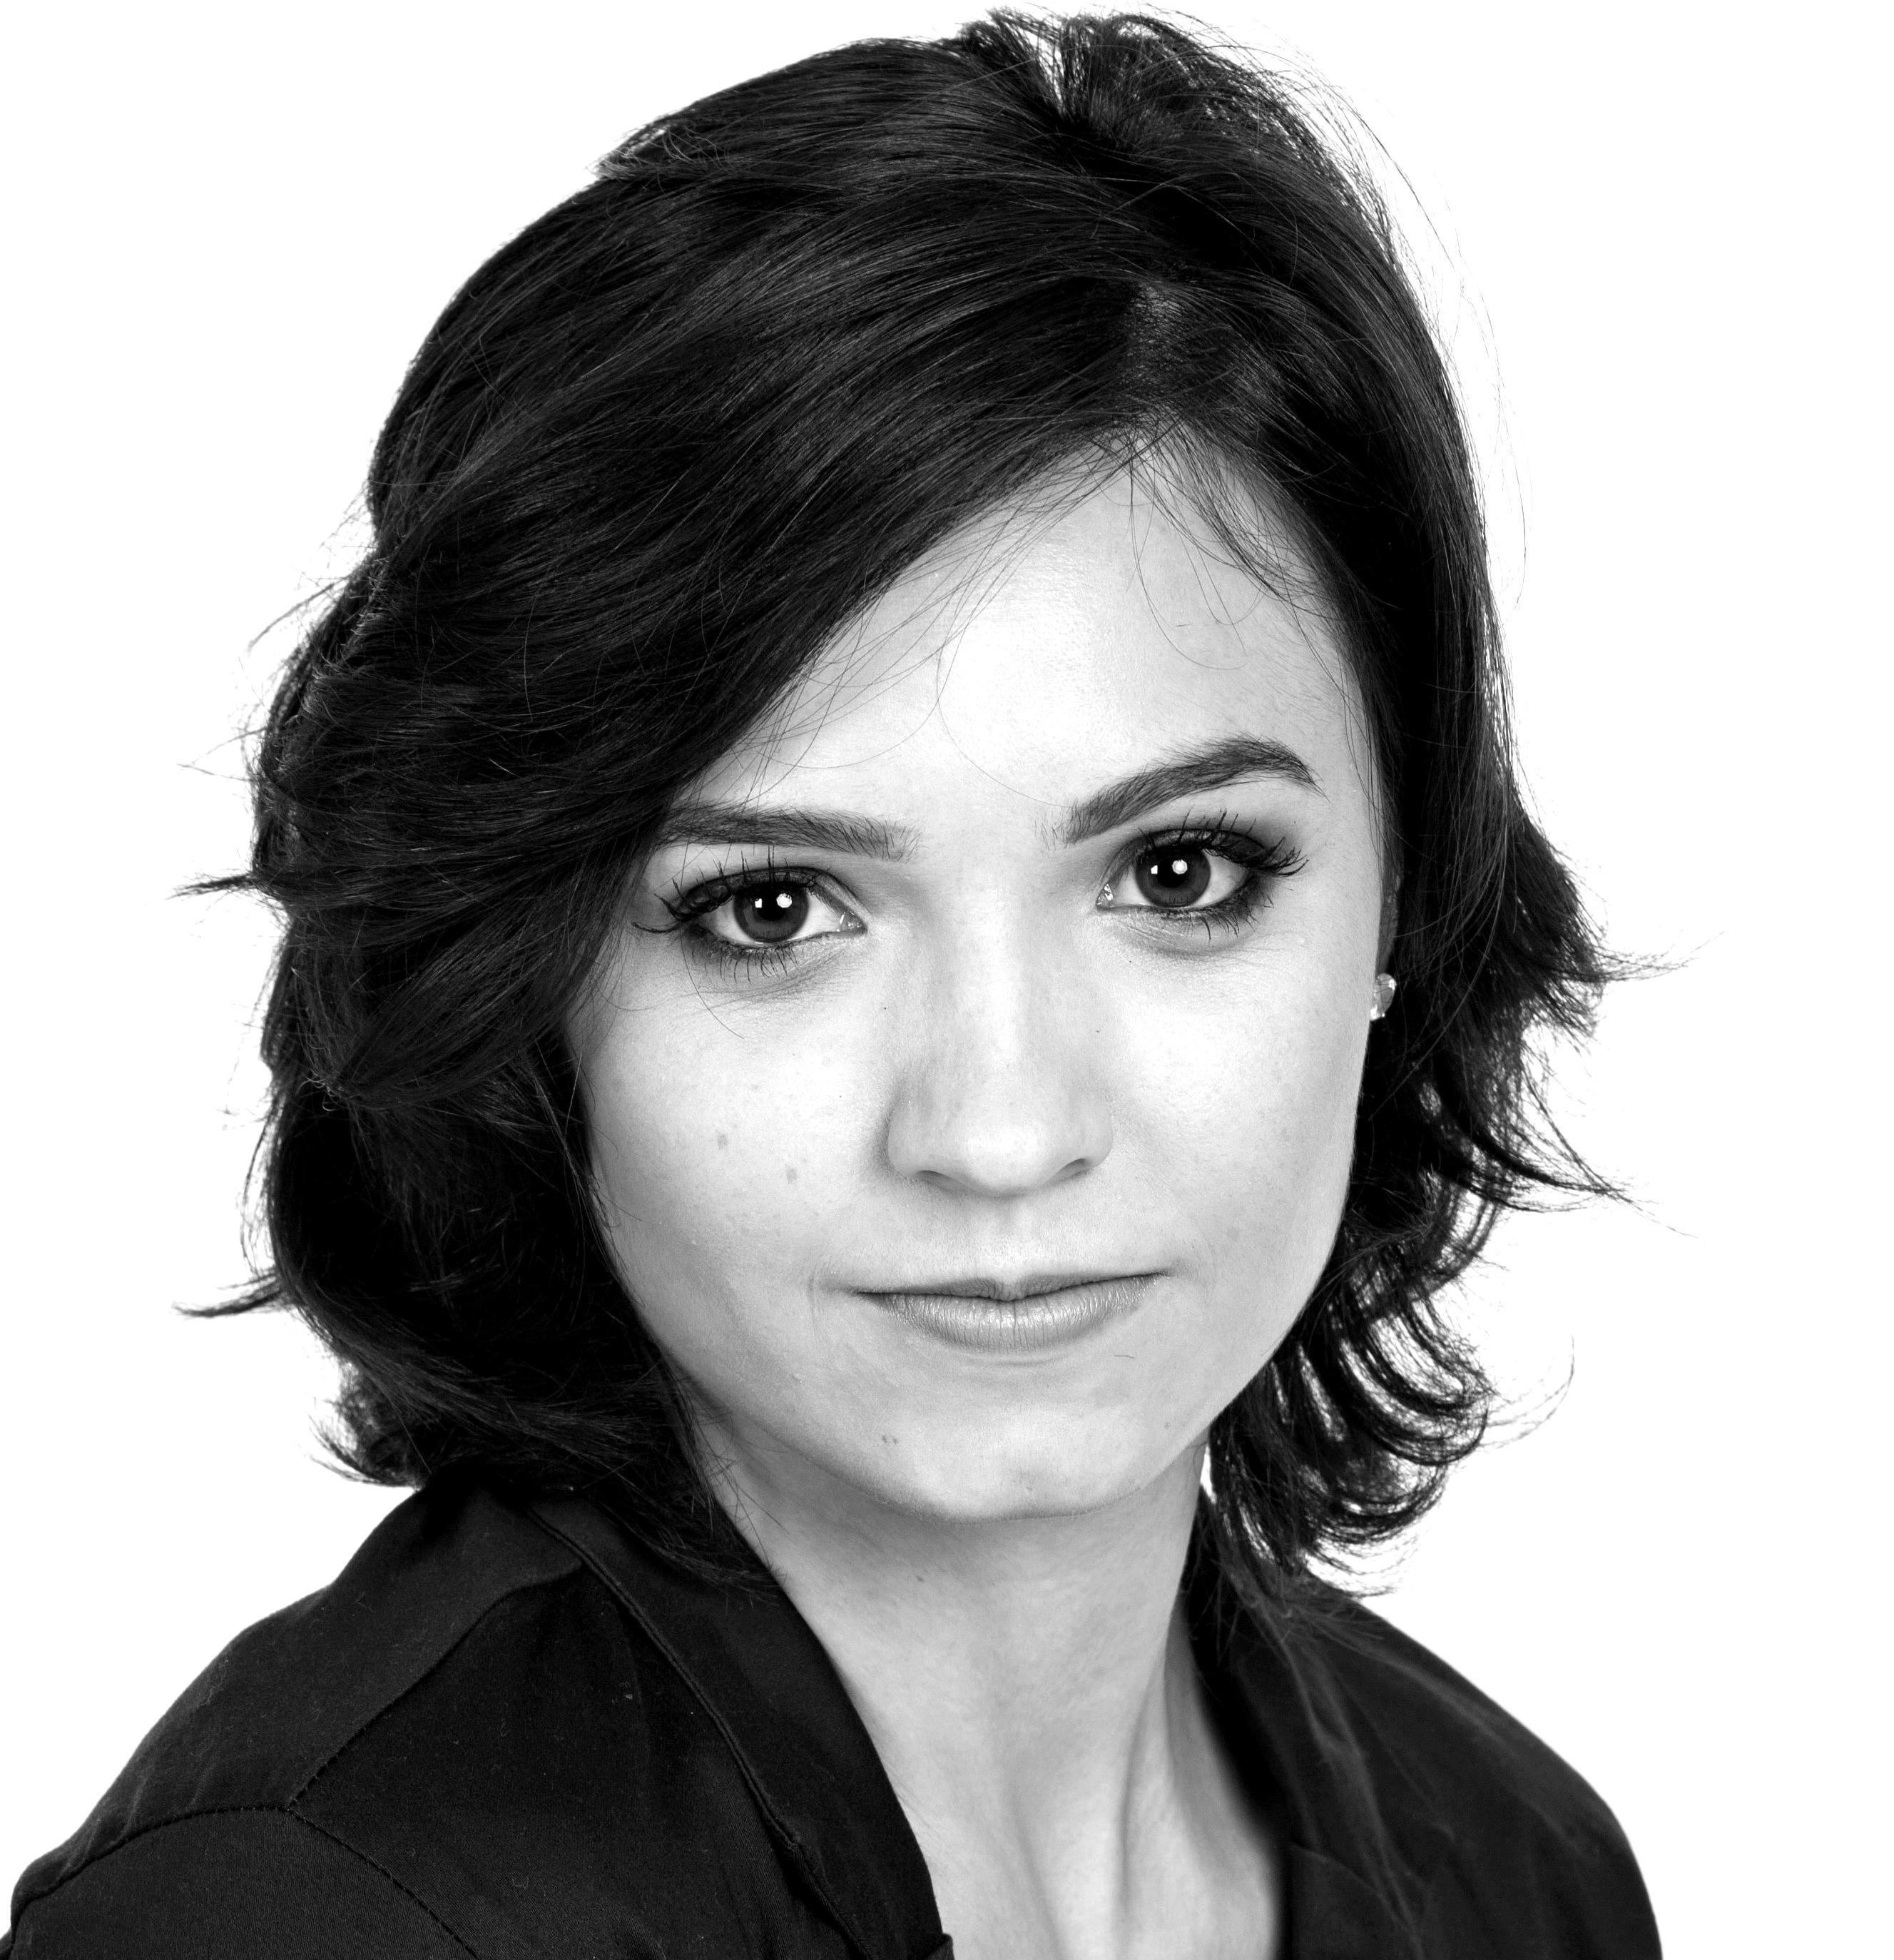 Maria Luisa Machado Porath